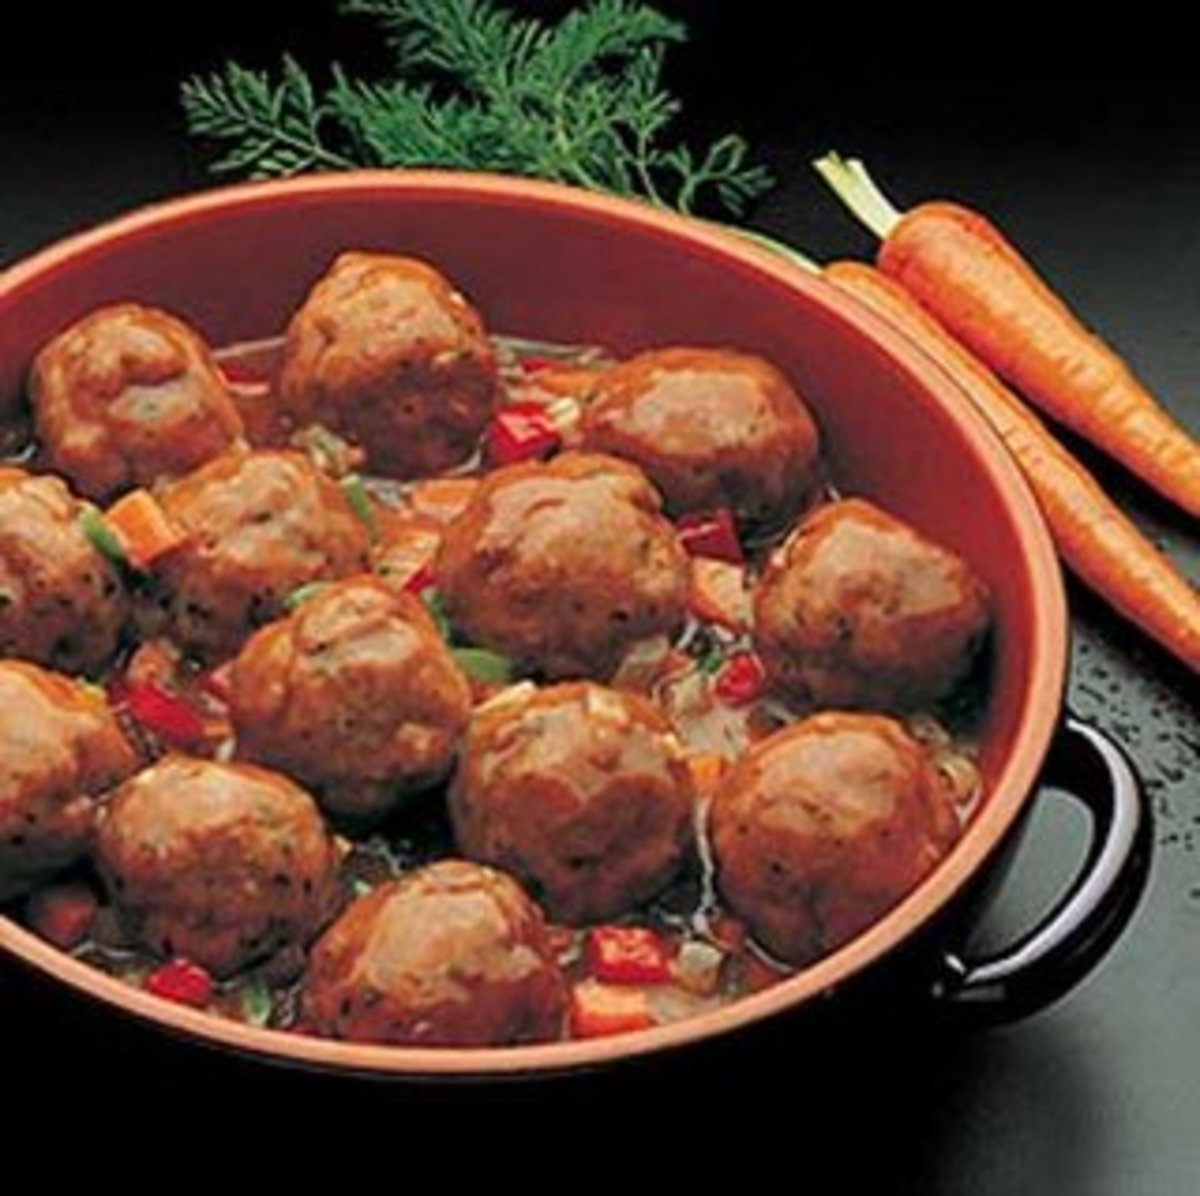 albondigas (meatballs) spanish tapas